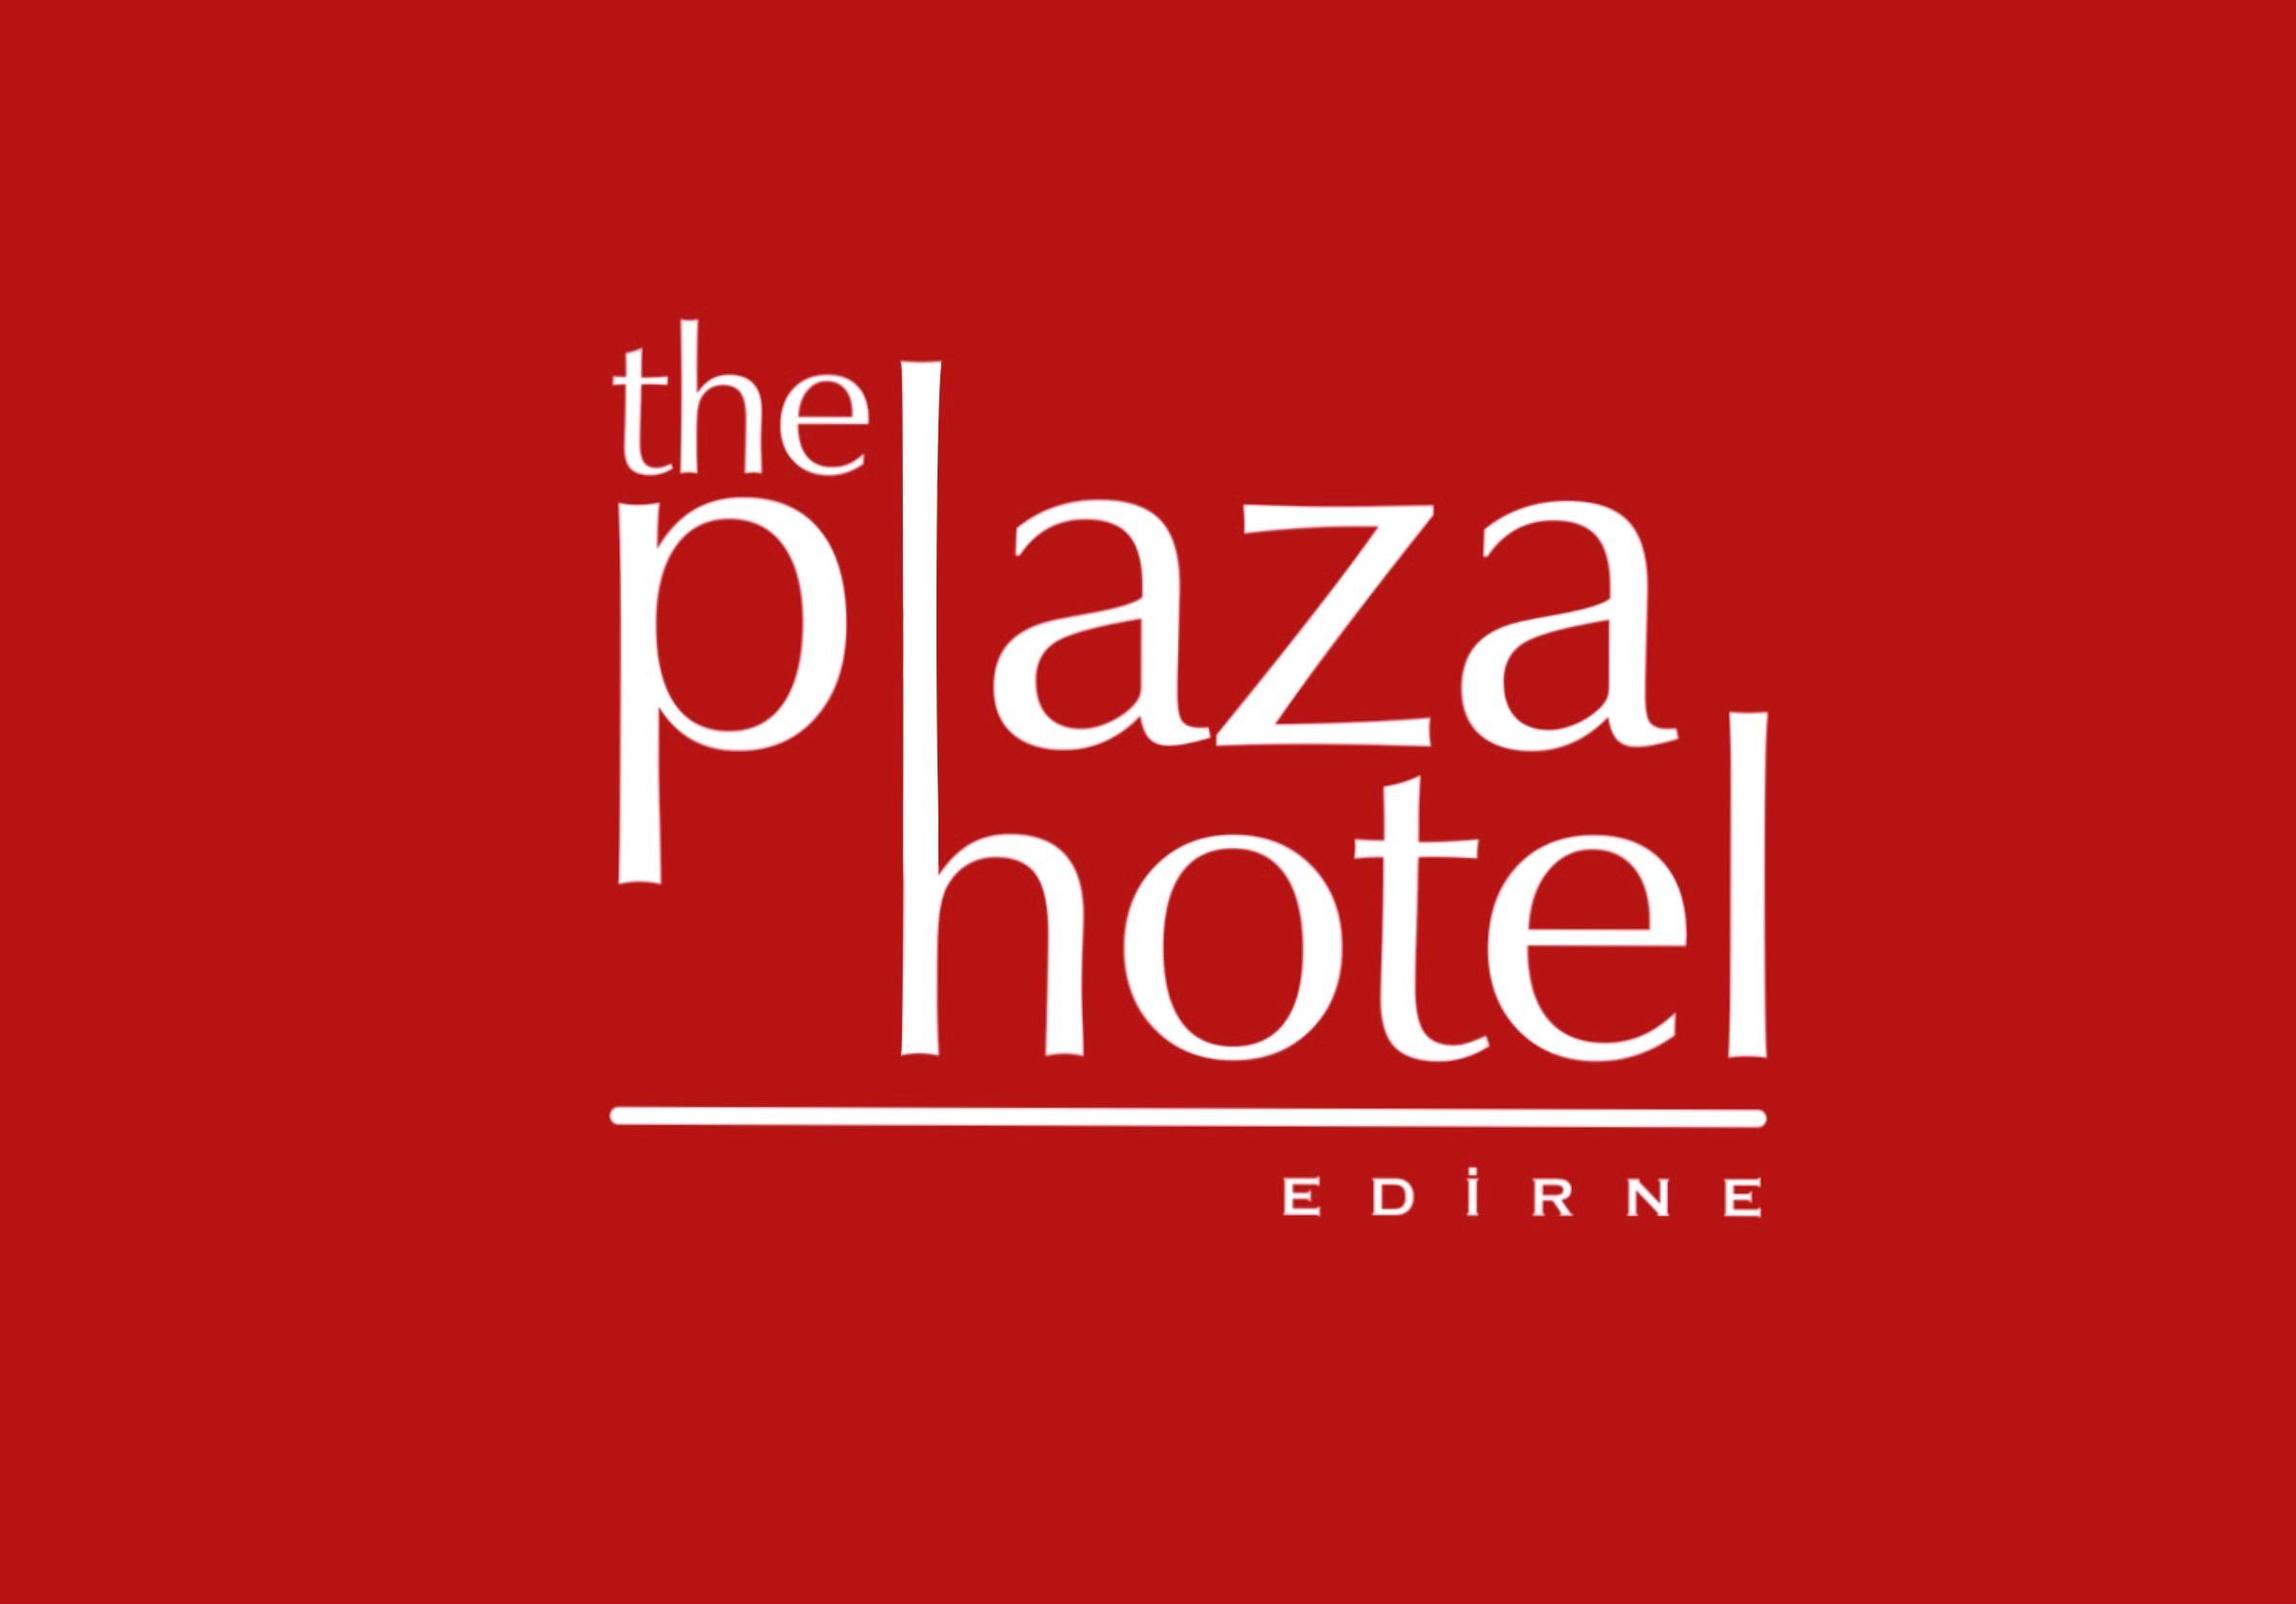 The Plaza Hotel Edirne